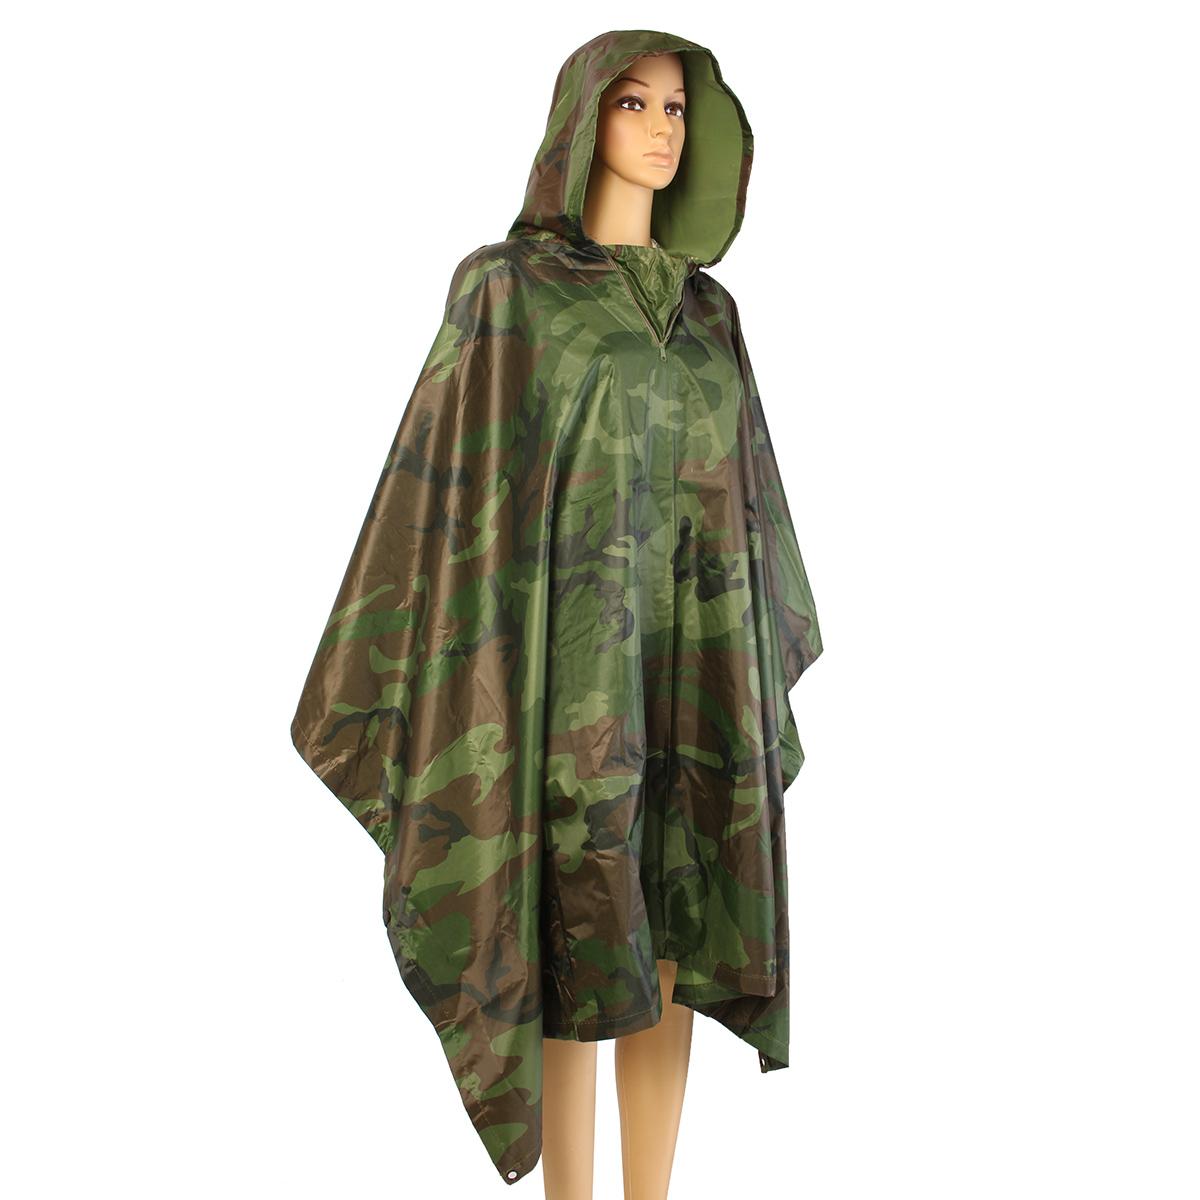 Outdoor Camping Camouflage Raincoat Waterproof Jungle